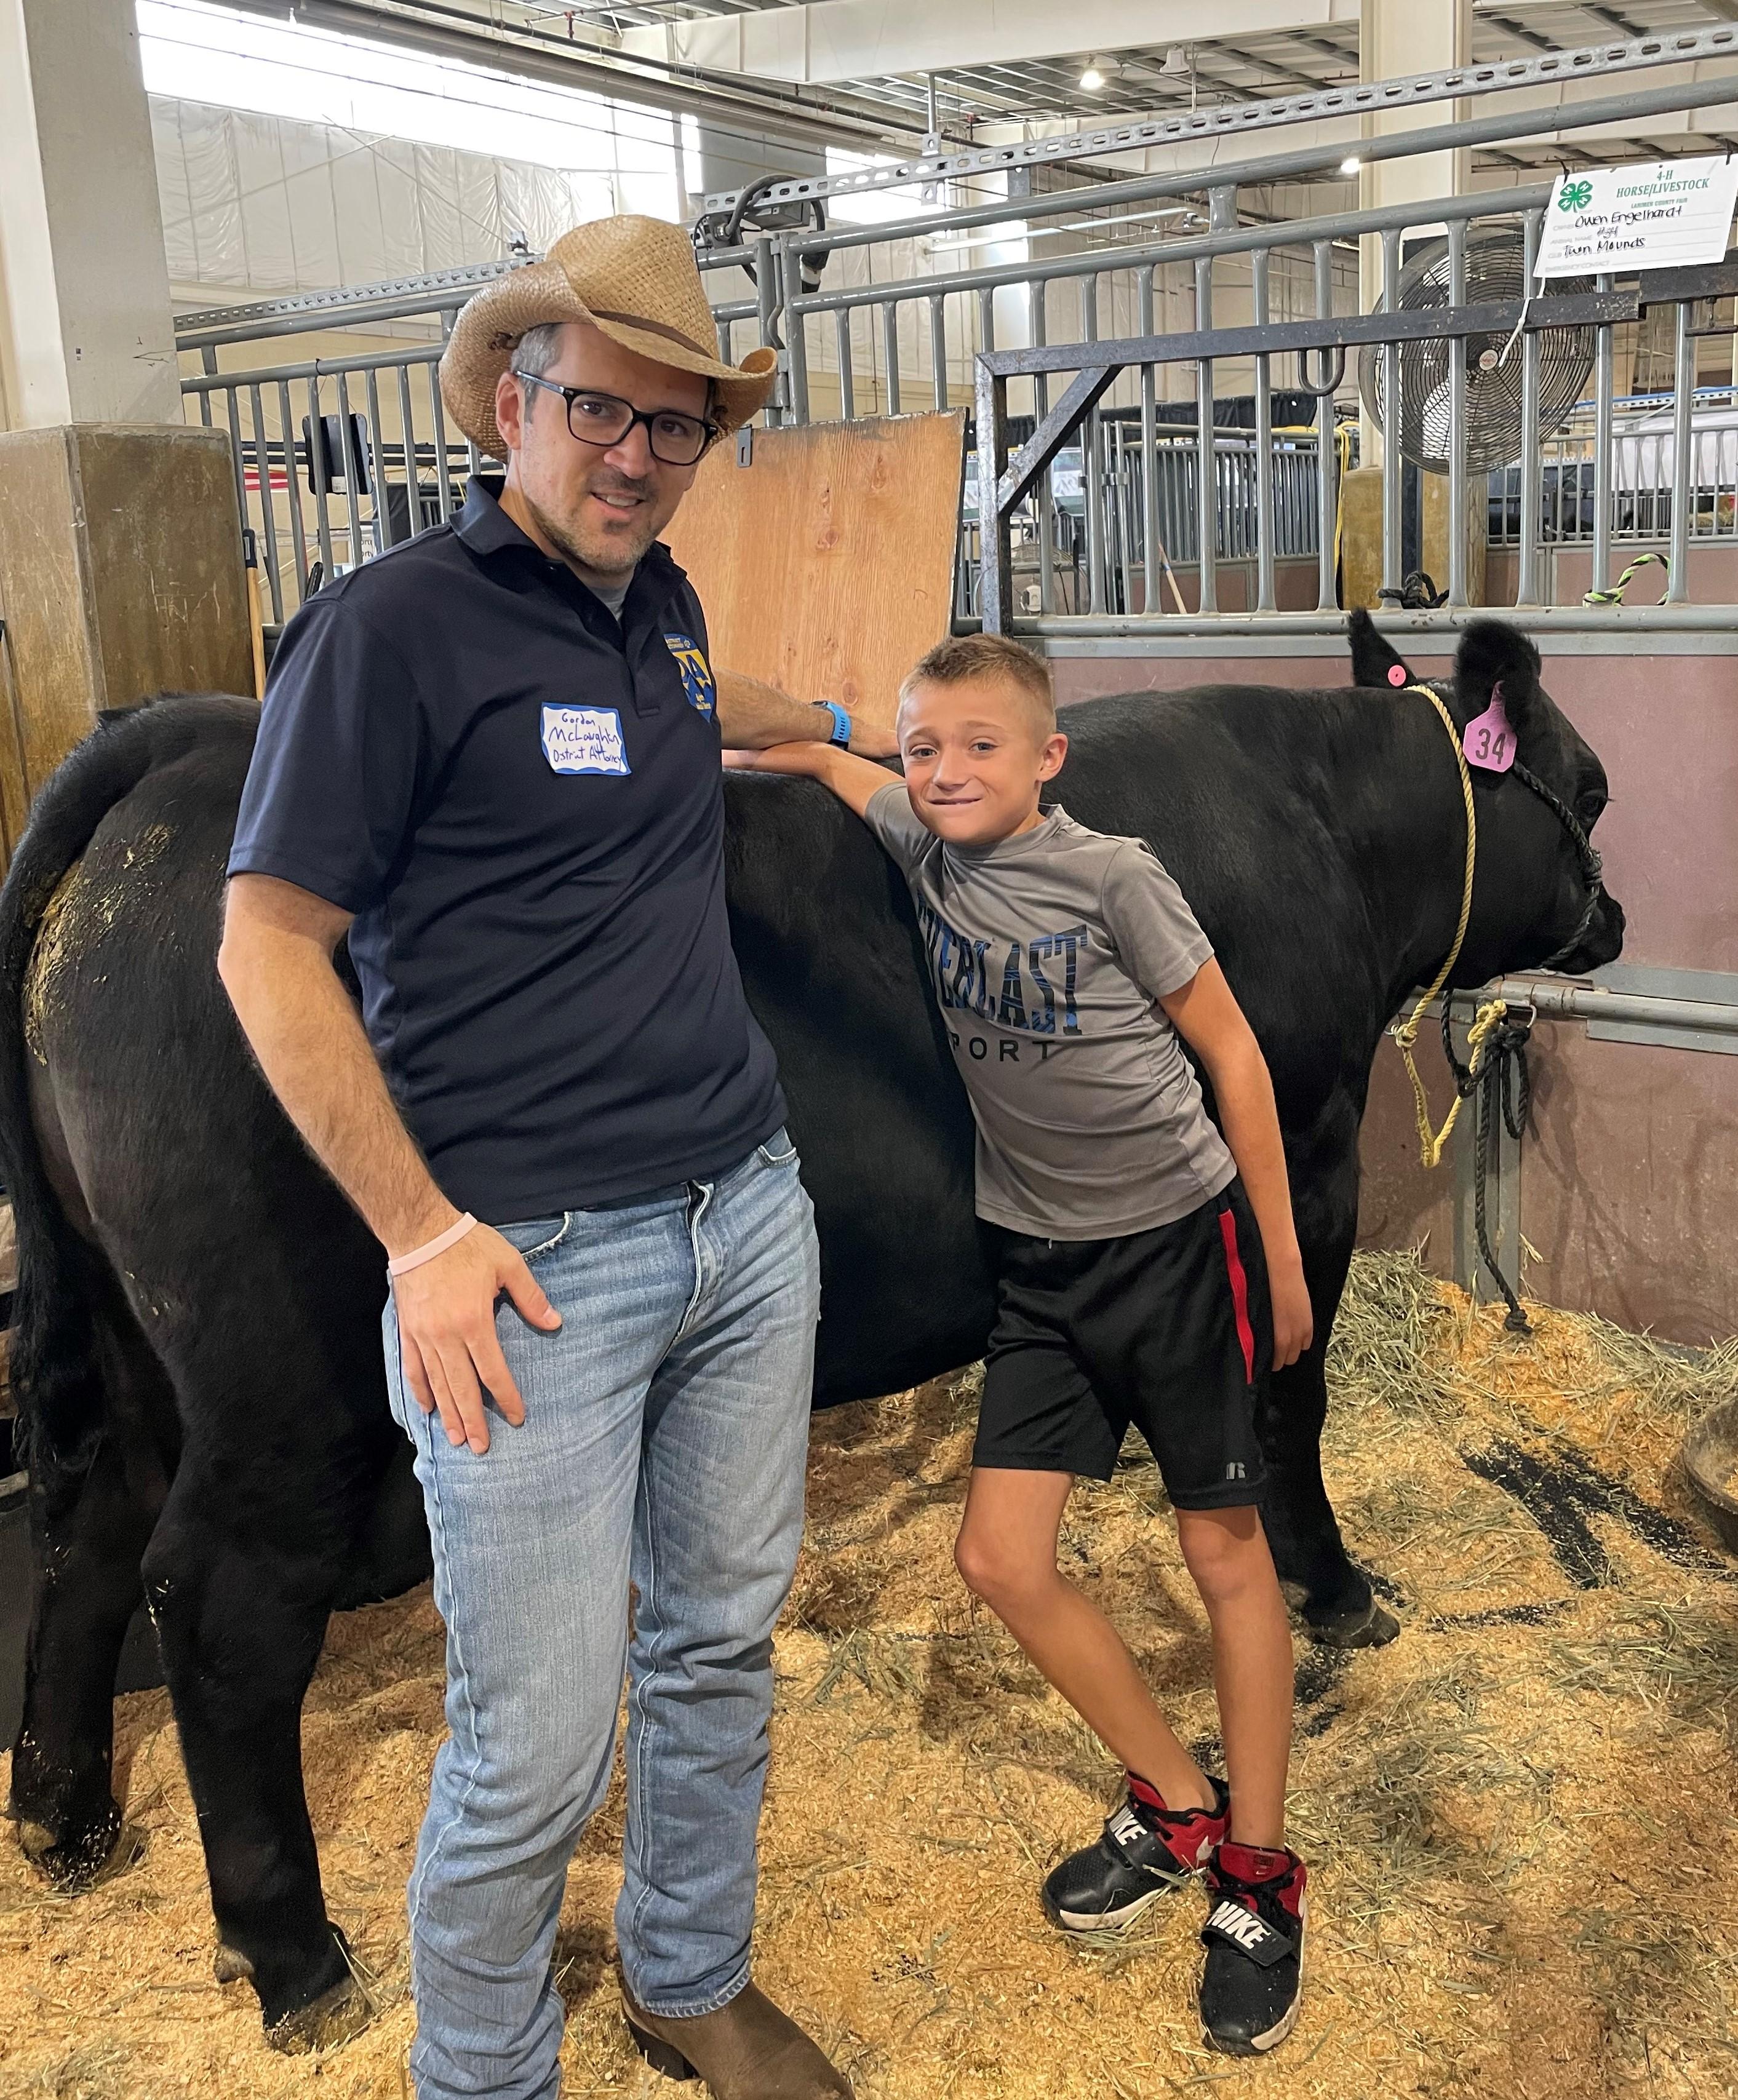 Image 9: DA McLaughlin and Owen at Larimer County Fair 2021